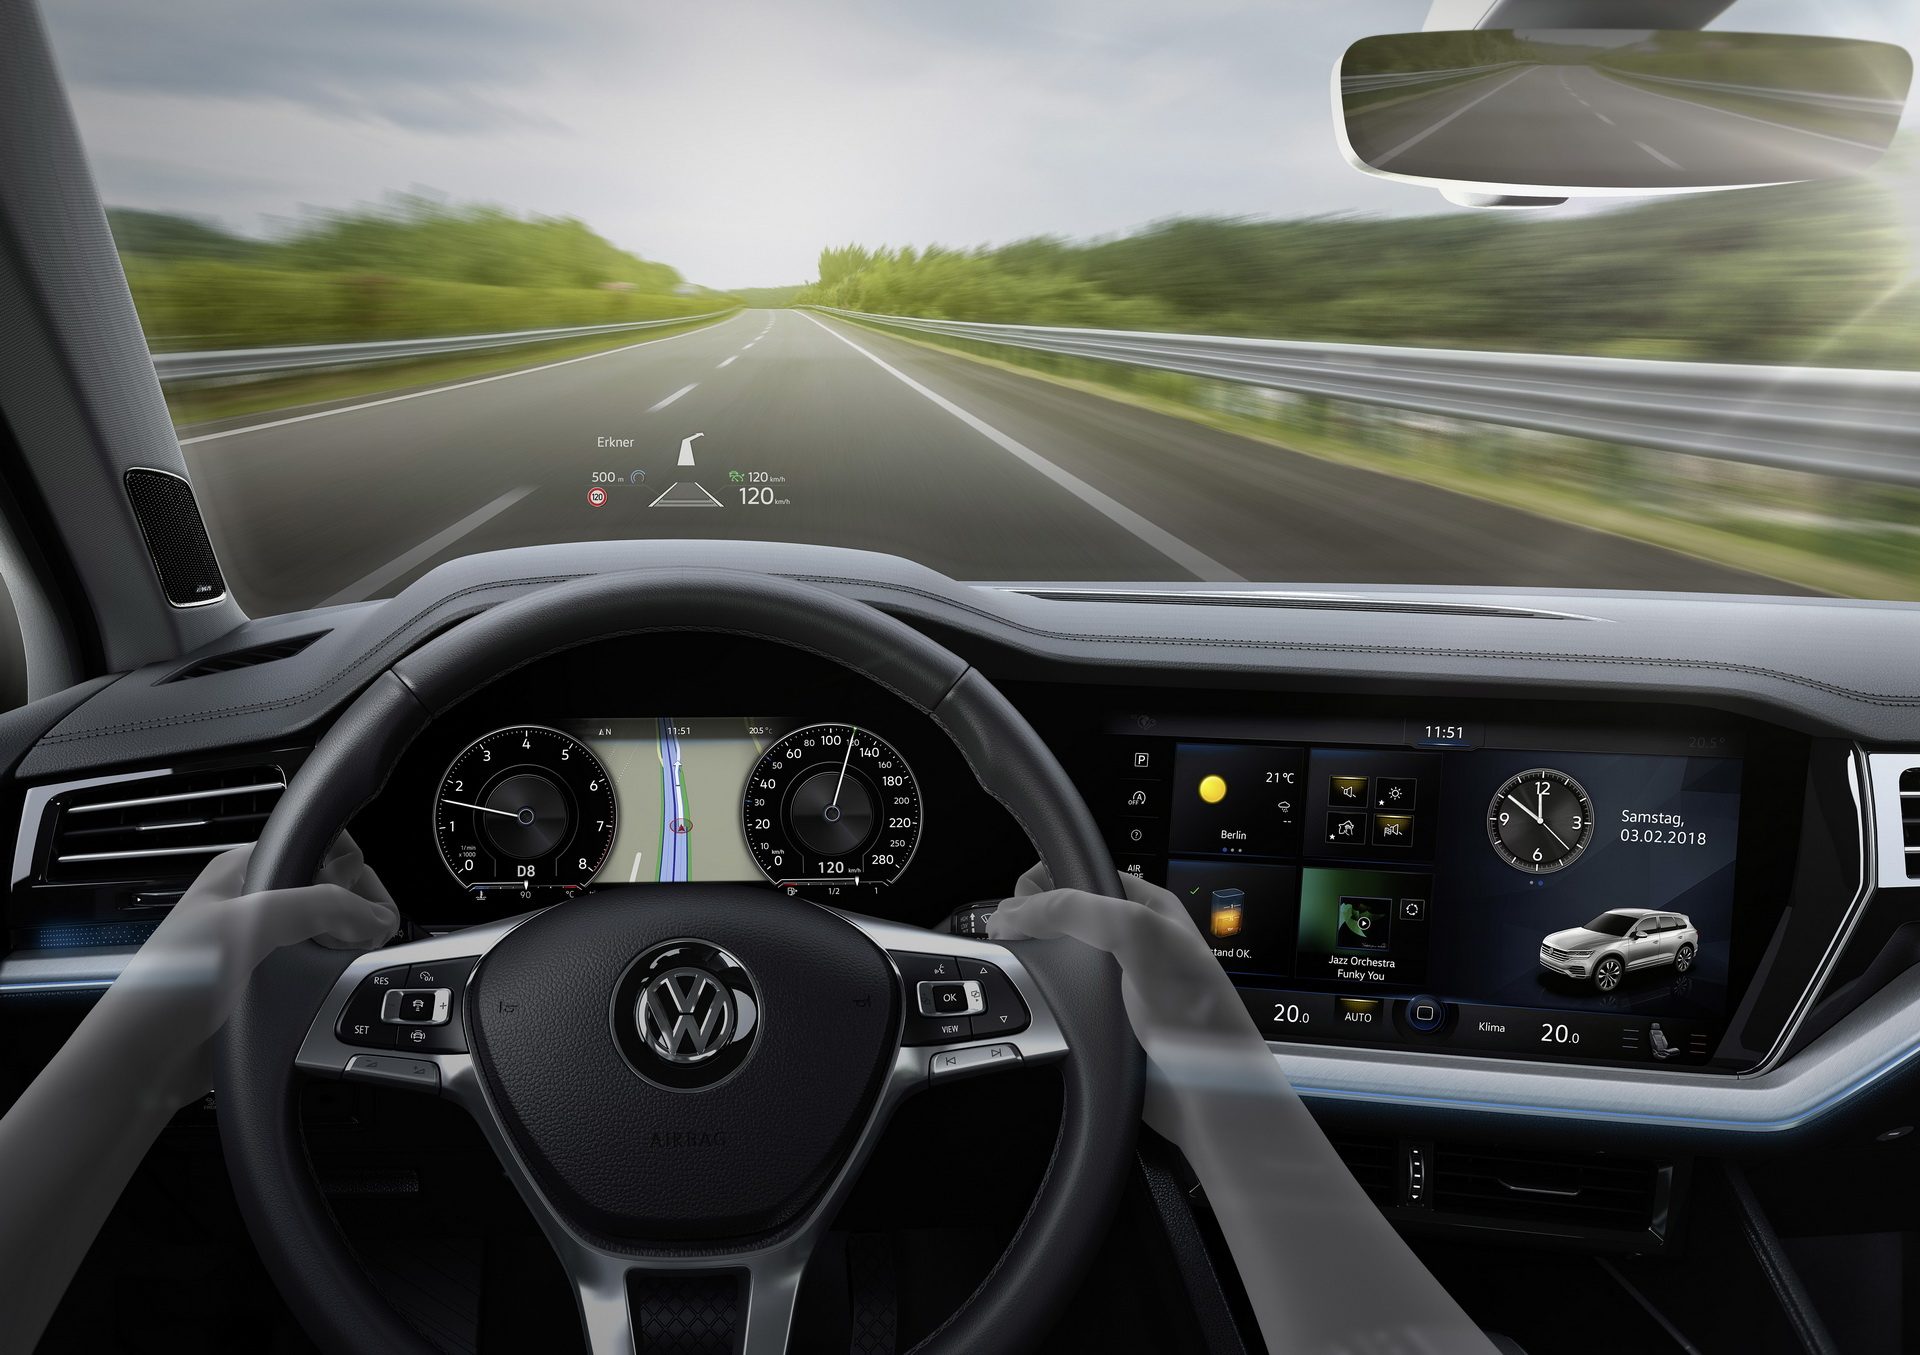 Volkswagen Touareg 2018 (36)